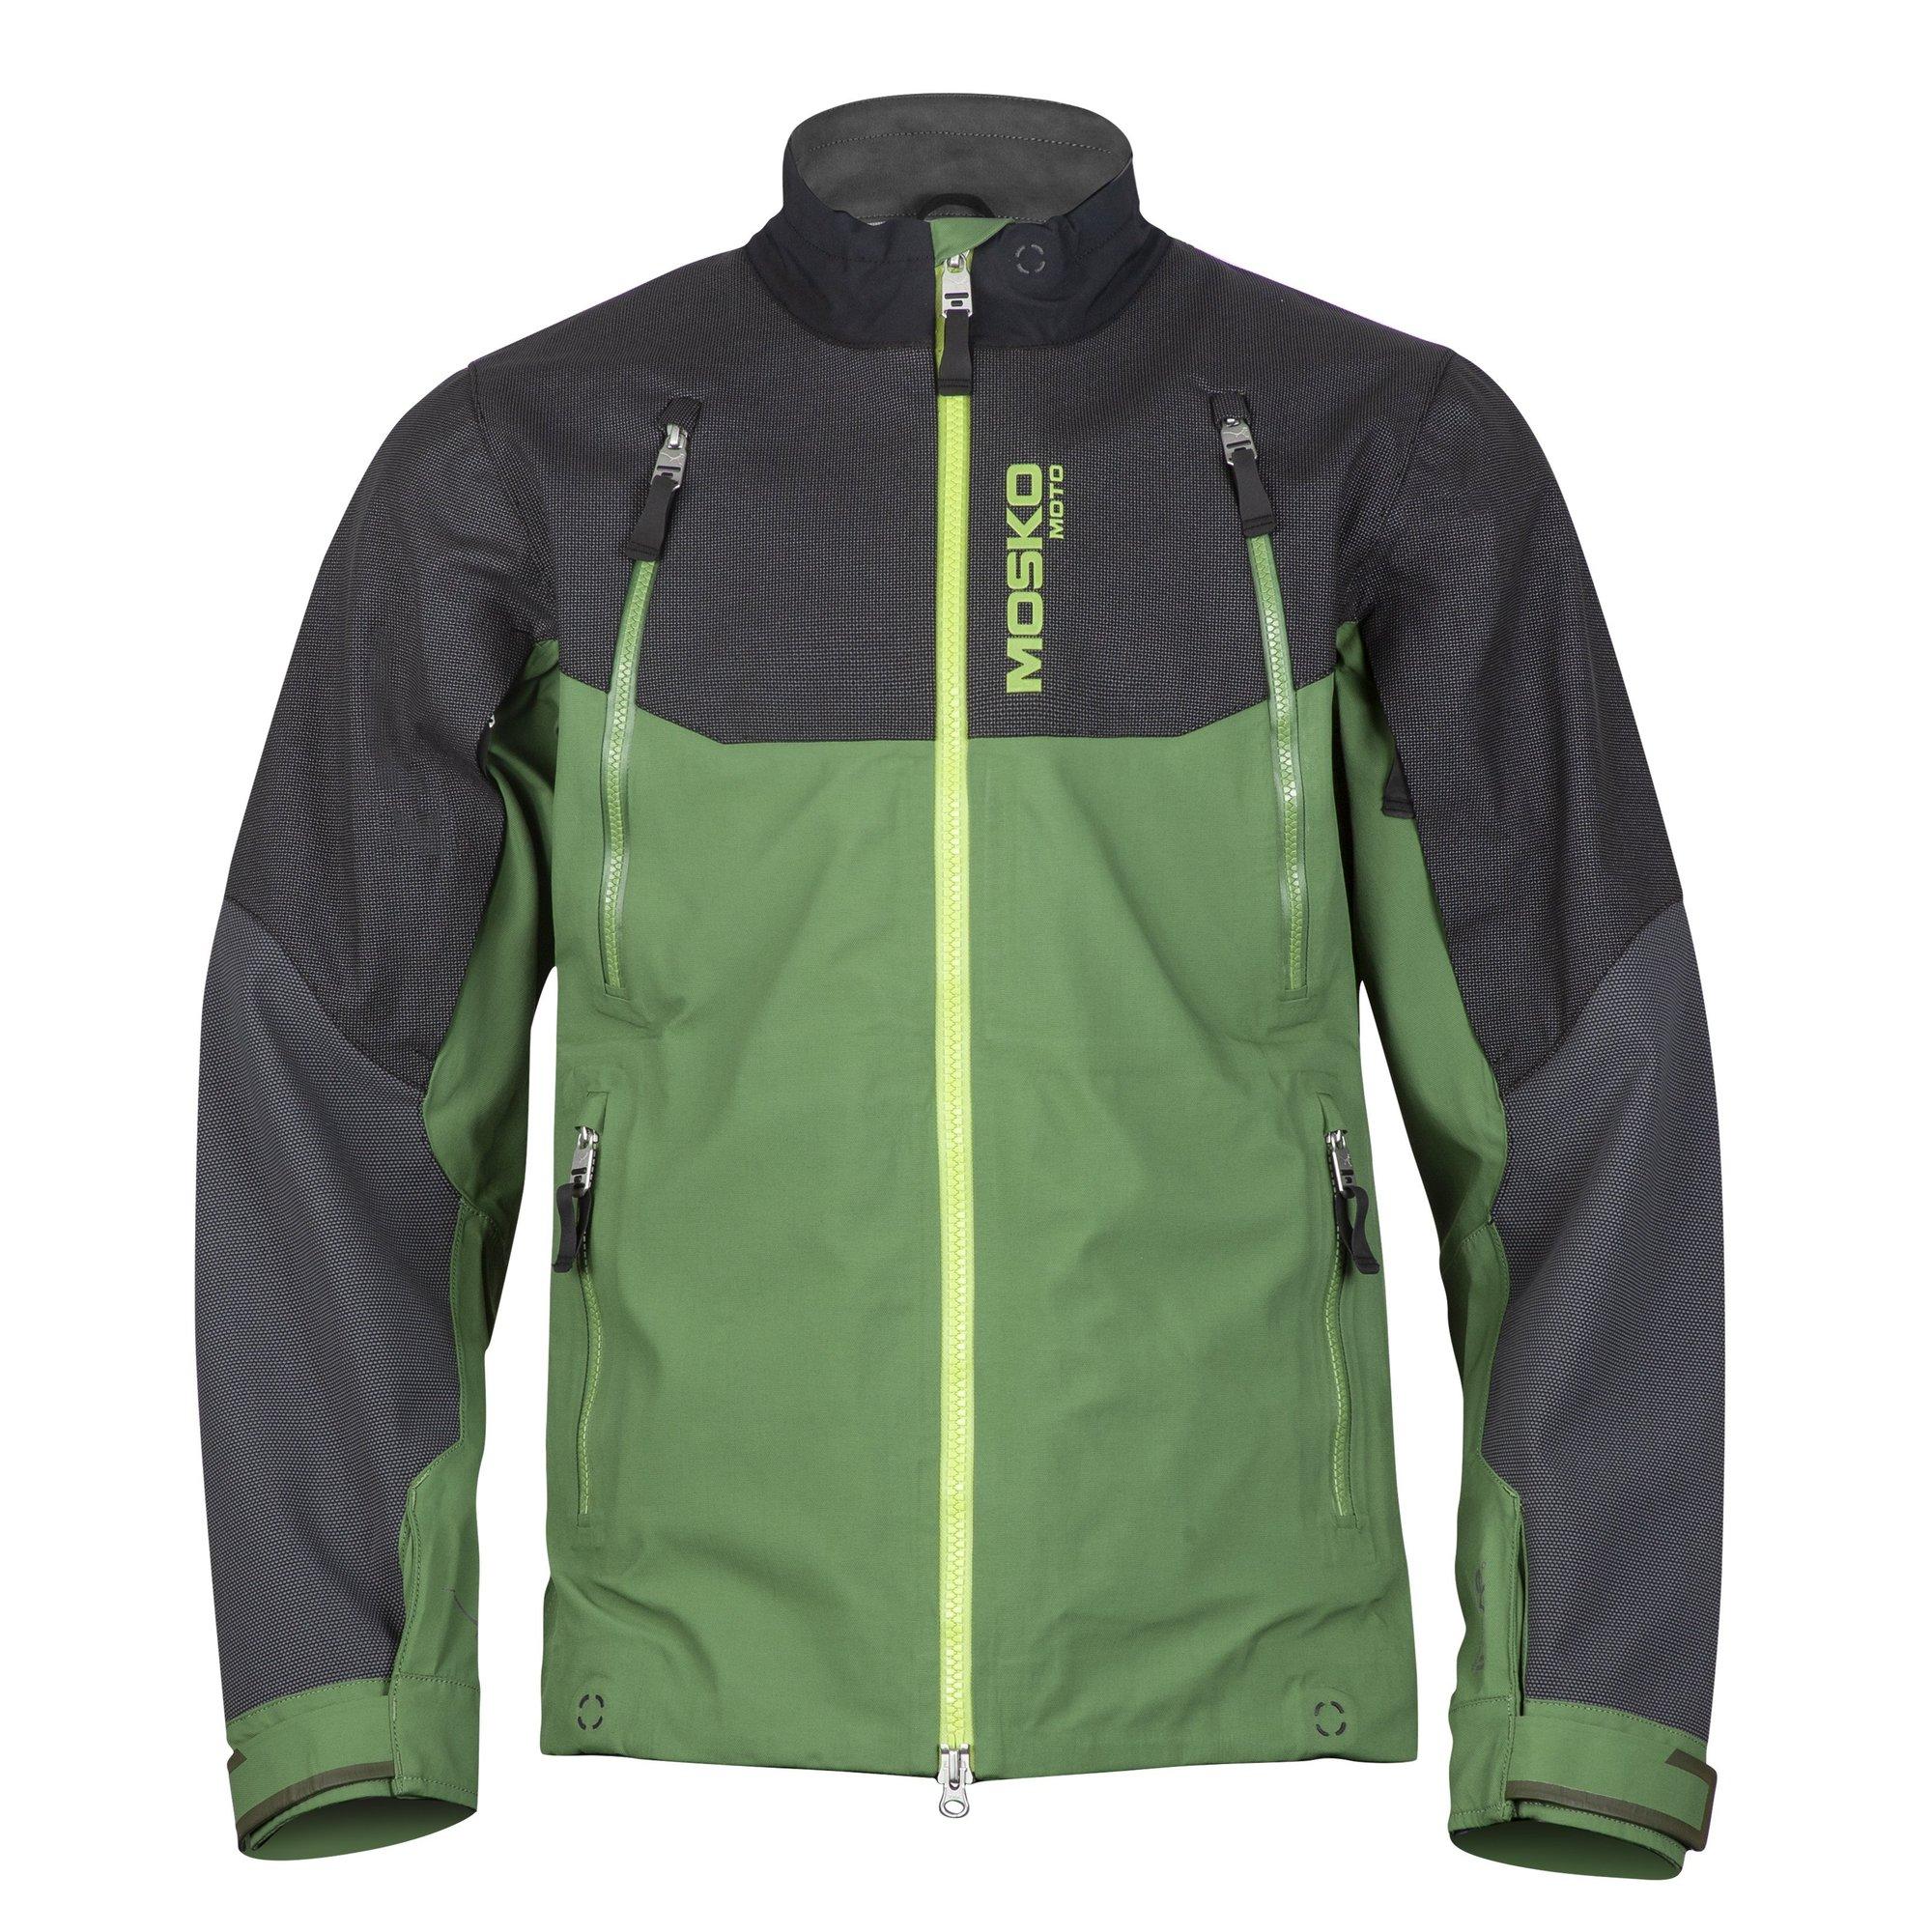 mosko-moto-apparel-s-charcoal-basilisk-jacket-11332268294205_2000x.jpg